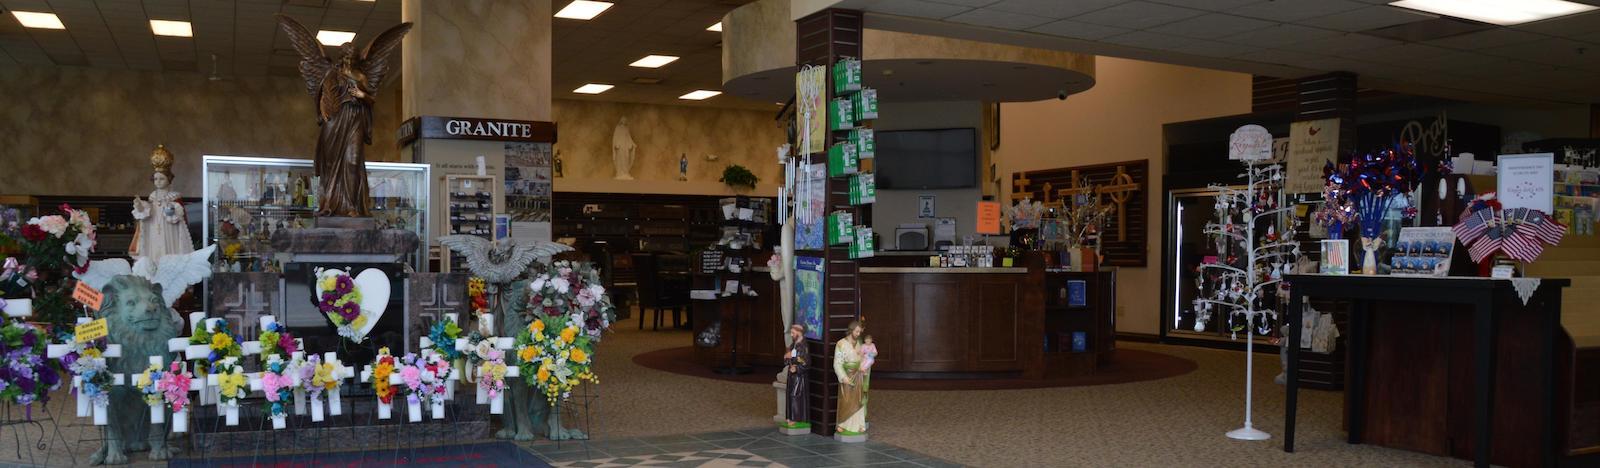 milano monuments cleveland main location showroom